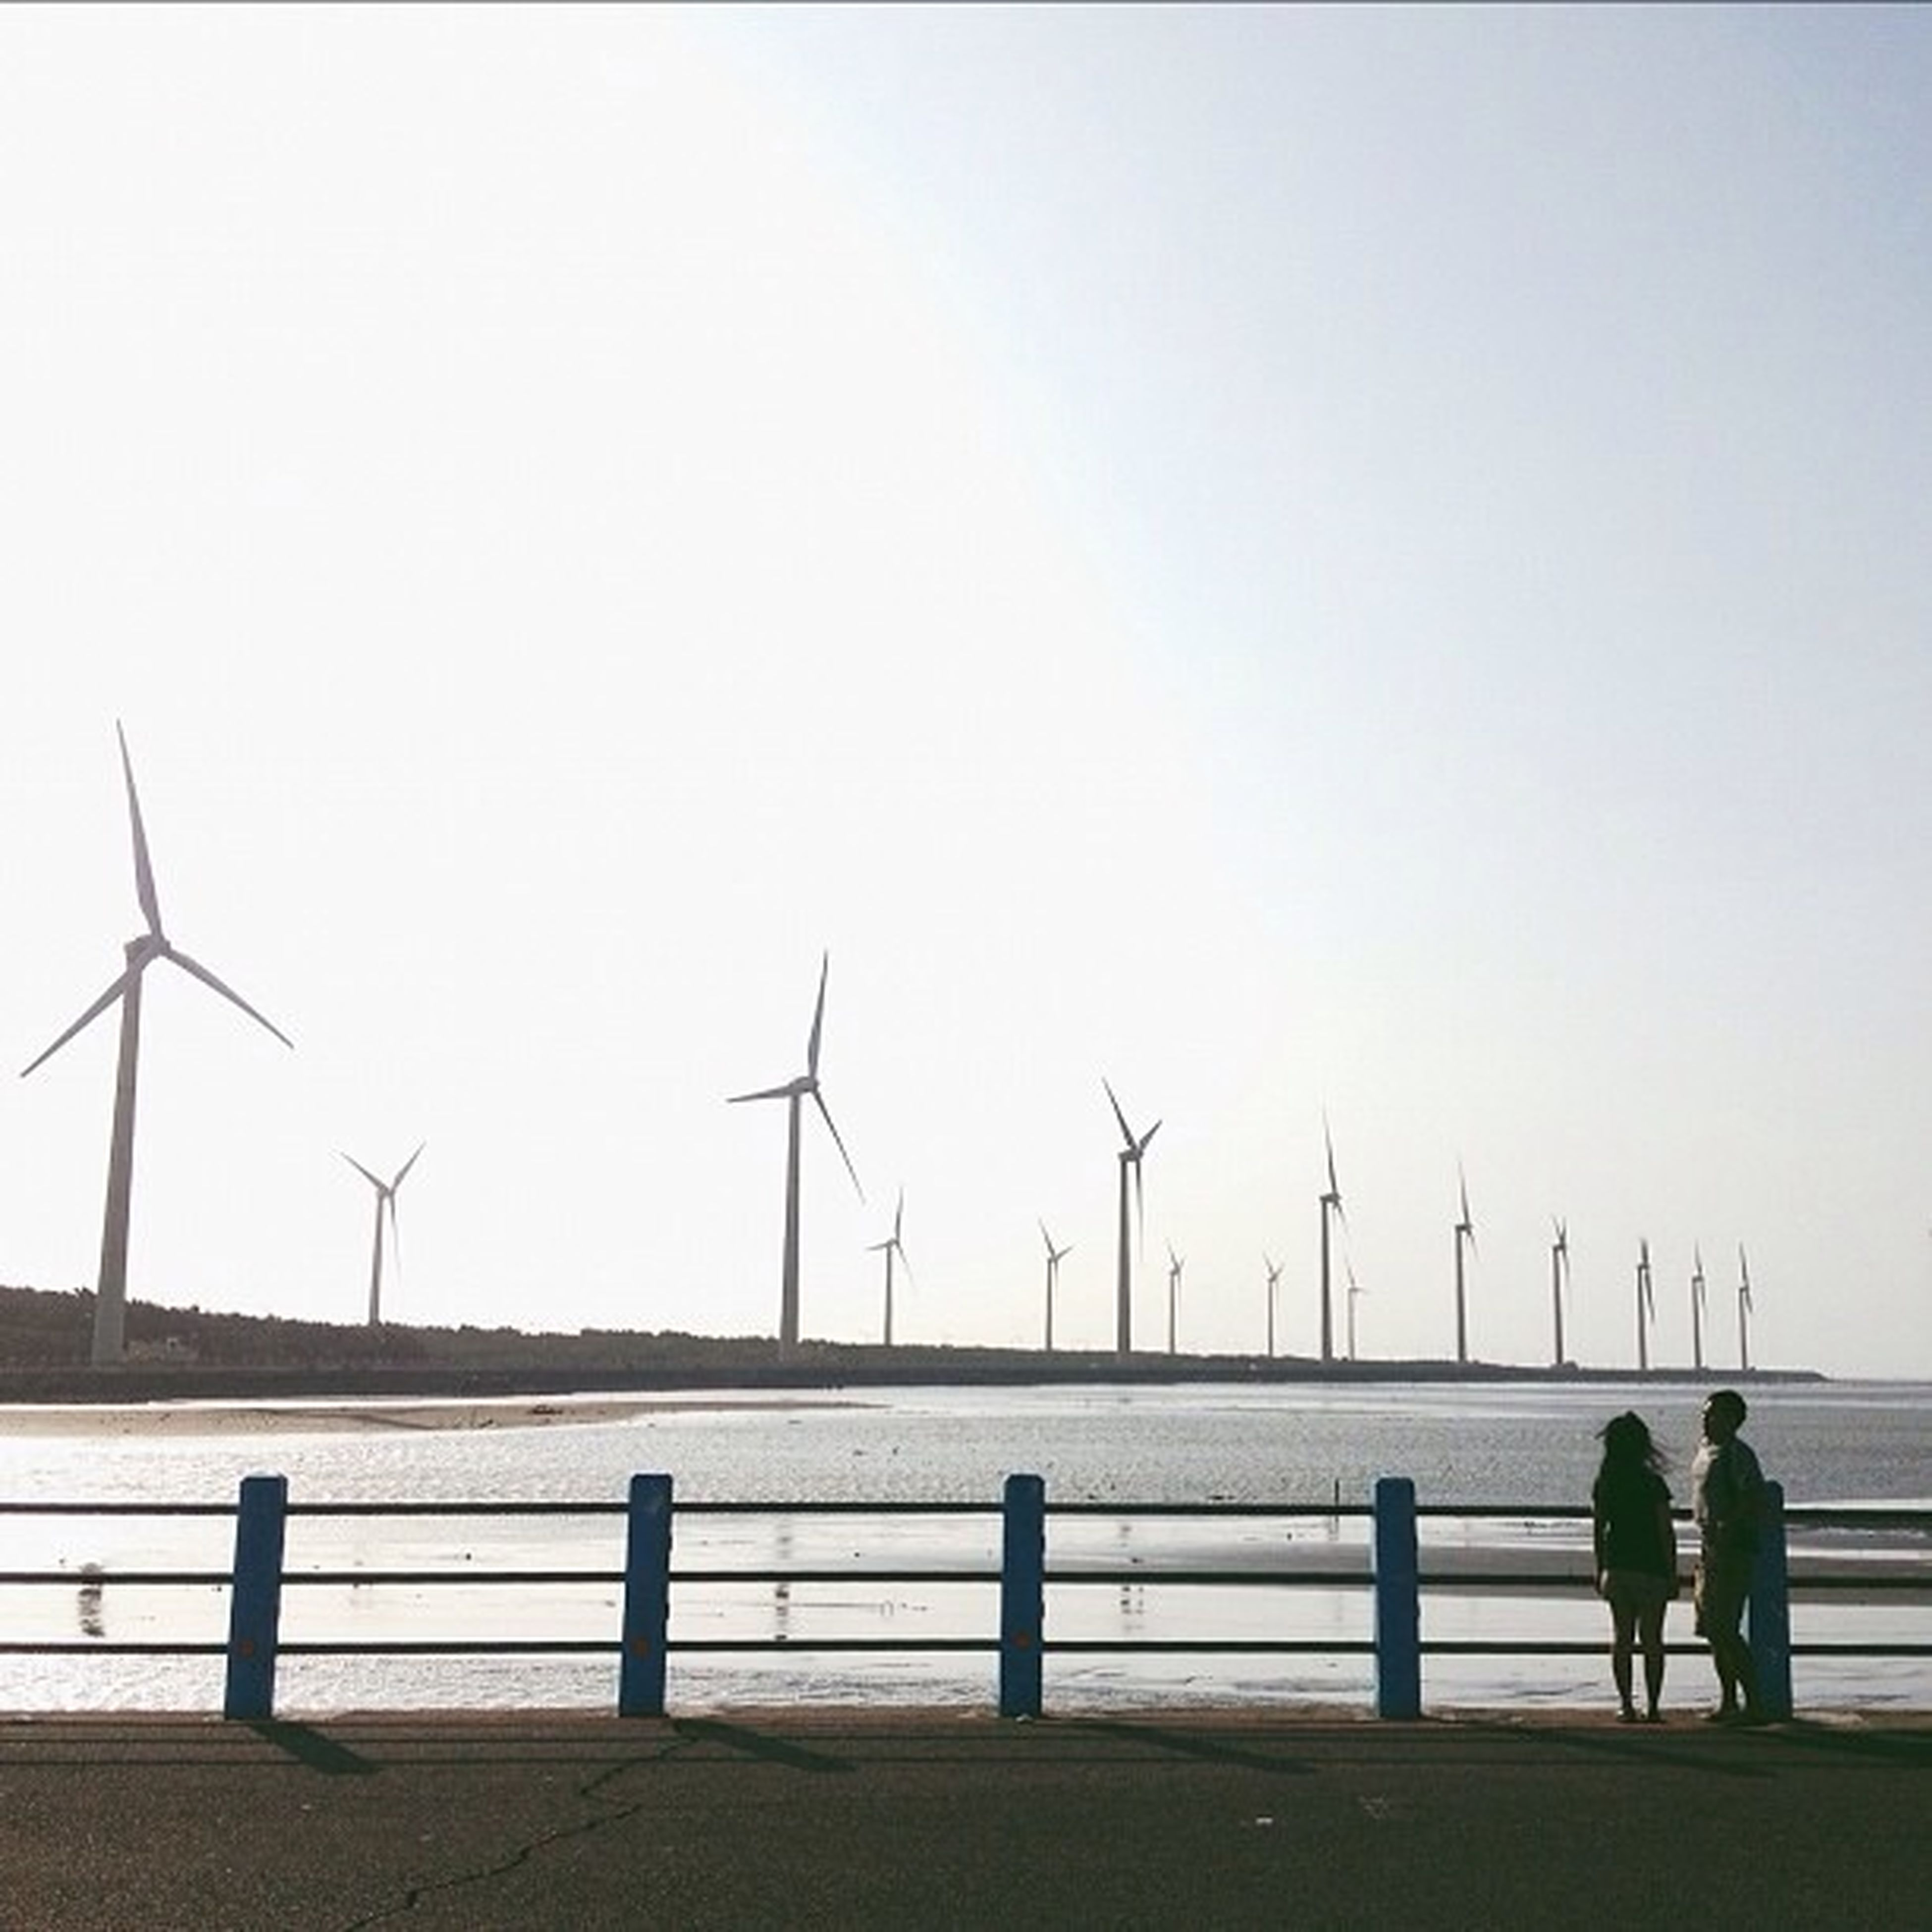 water, sea, men, copy space, clear sky, crane - construction machinery, crane, sky, silhouette, lifestyles, leisure activity, standing, railing, built structure, nature, commercial dock, person, pier